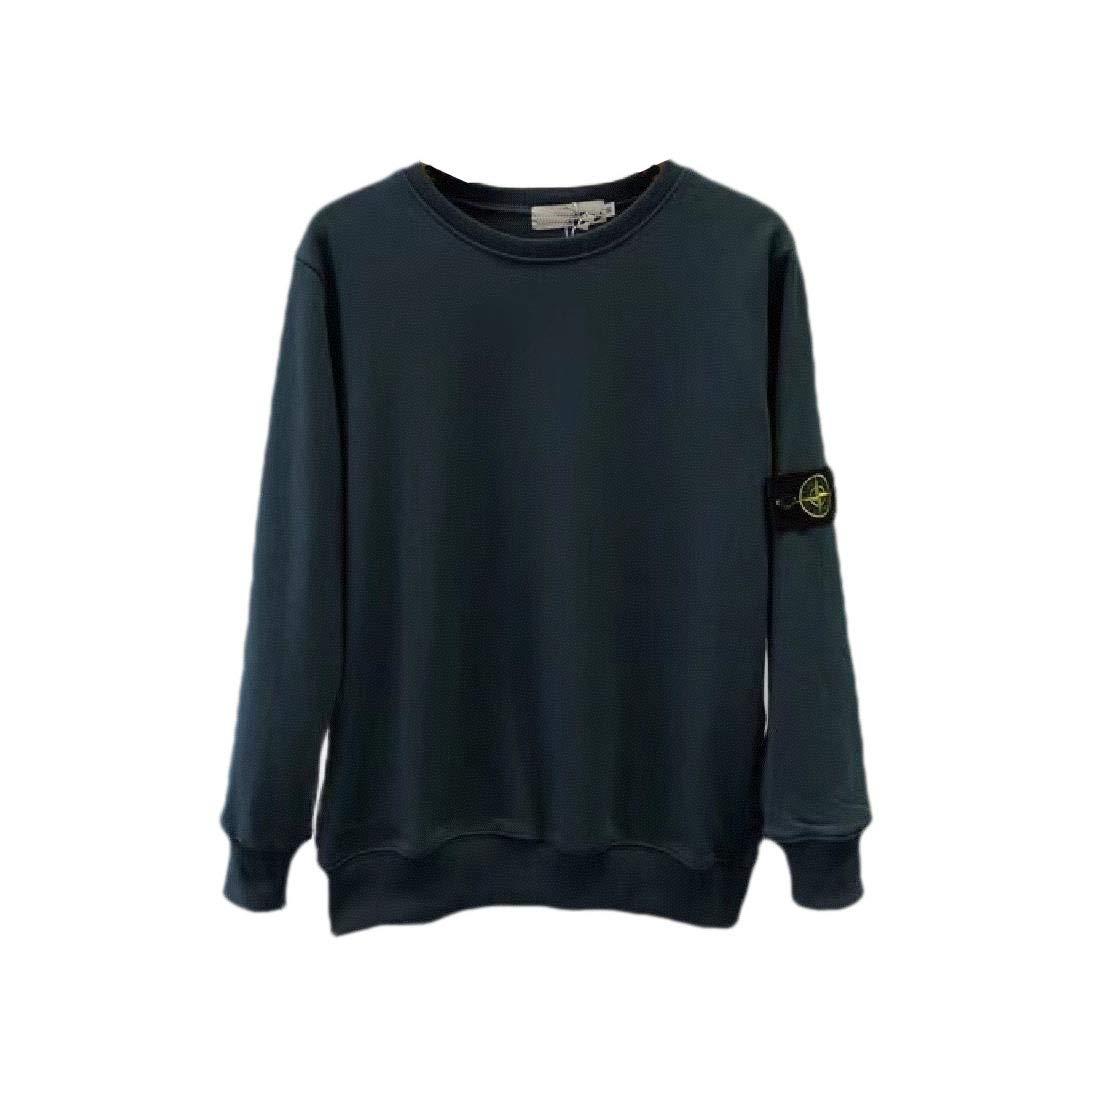 Zimaes-Men Crew-Neck Pullover Long-Sleeve Basic Solid Color Sweatshirt